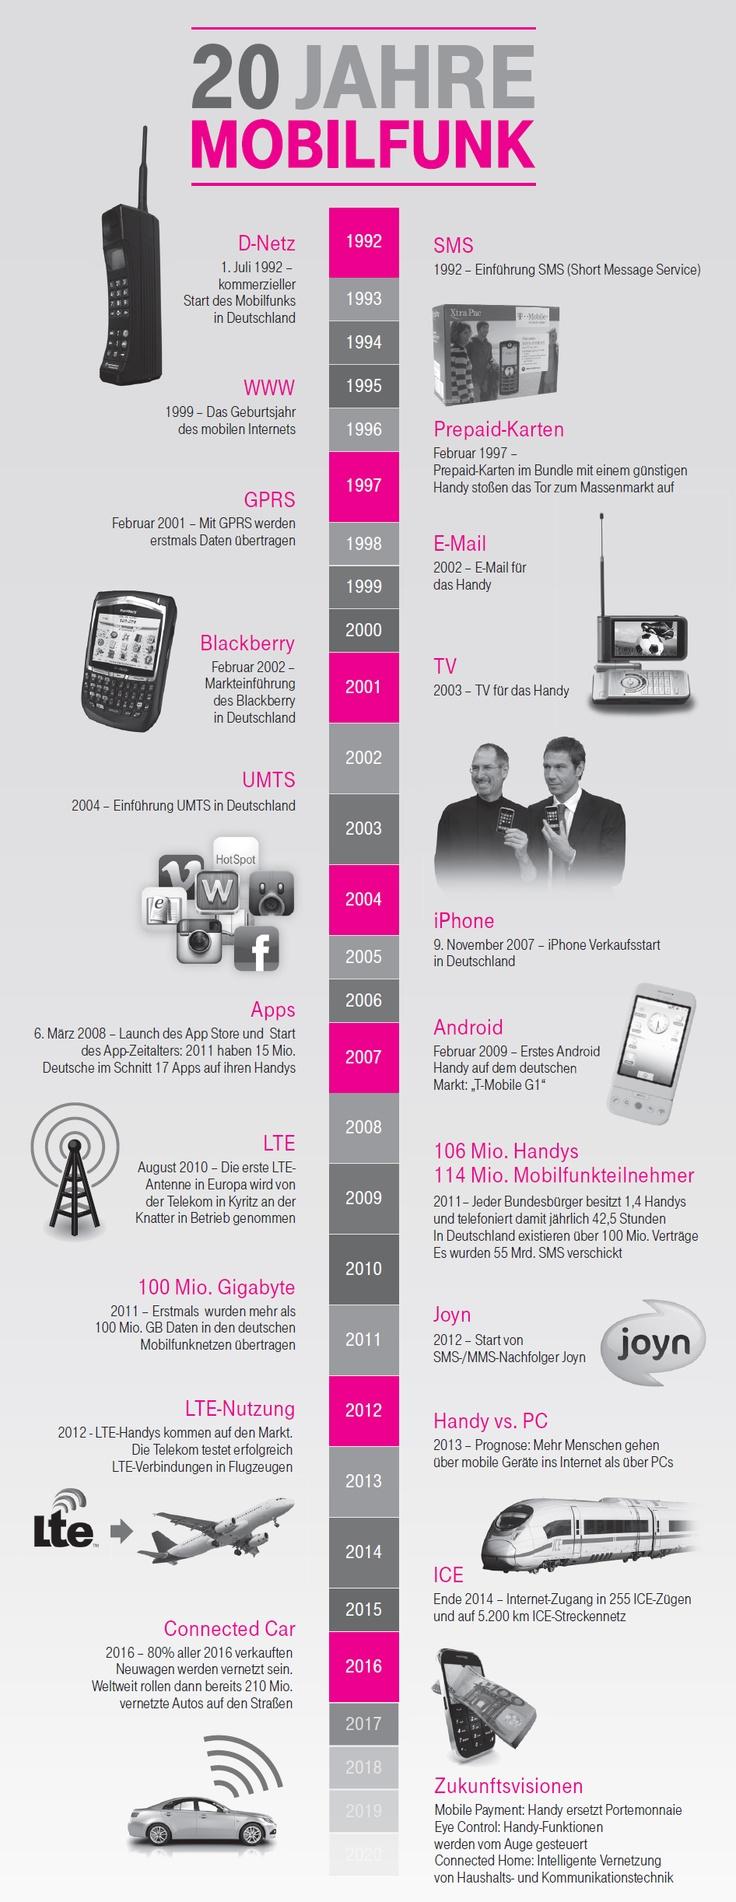 TimelineMilestones_20JahreMobilfunk: Jahre Mobilfunk, Jahr Mobilfunk, Digital Mobilfunk, Mobiles Zeitgeist, 20 Jahre, German Infographics, Jahr Mobiles, Telekom Infografik, Mobilfunk Mobiles